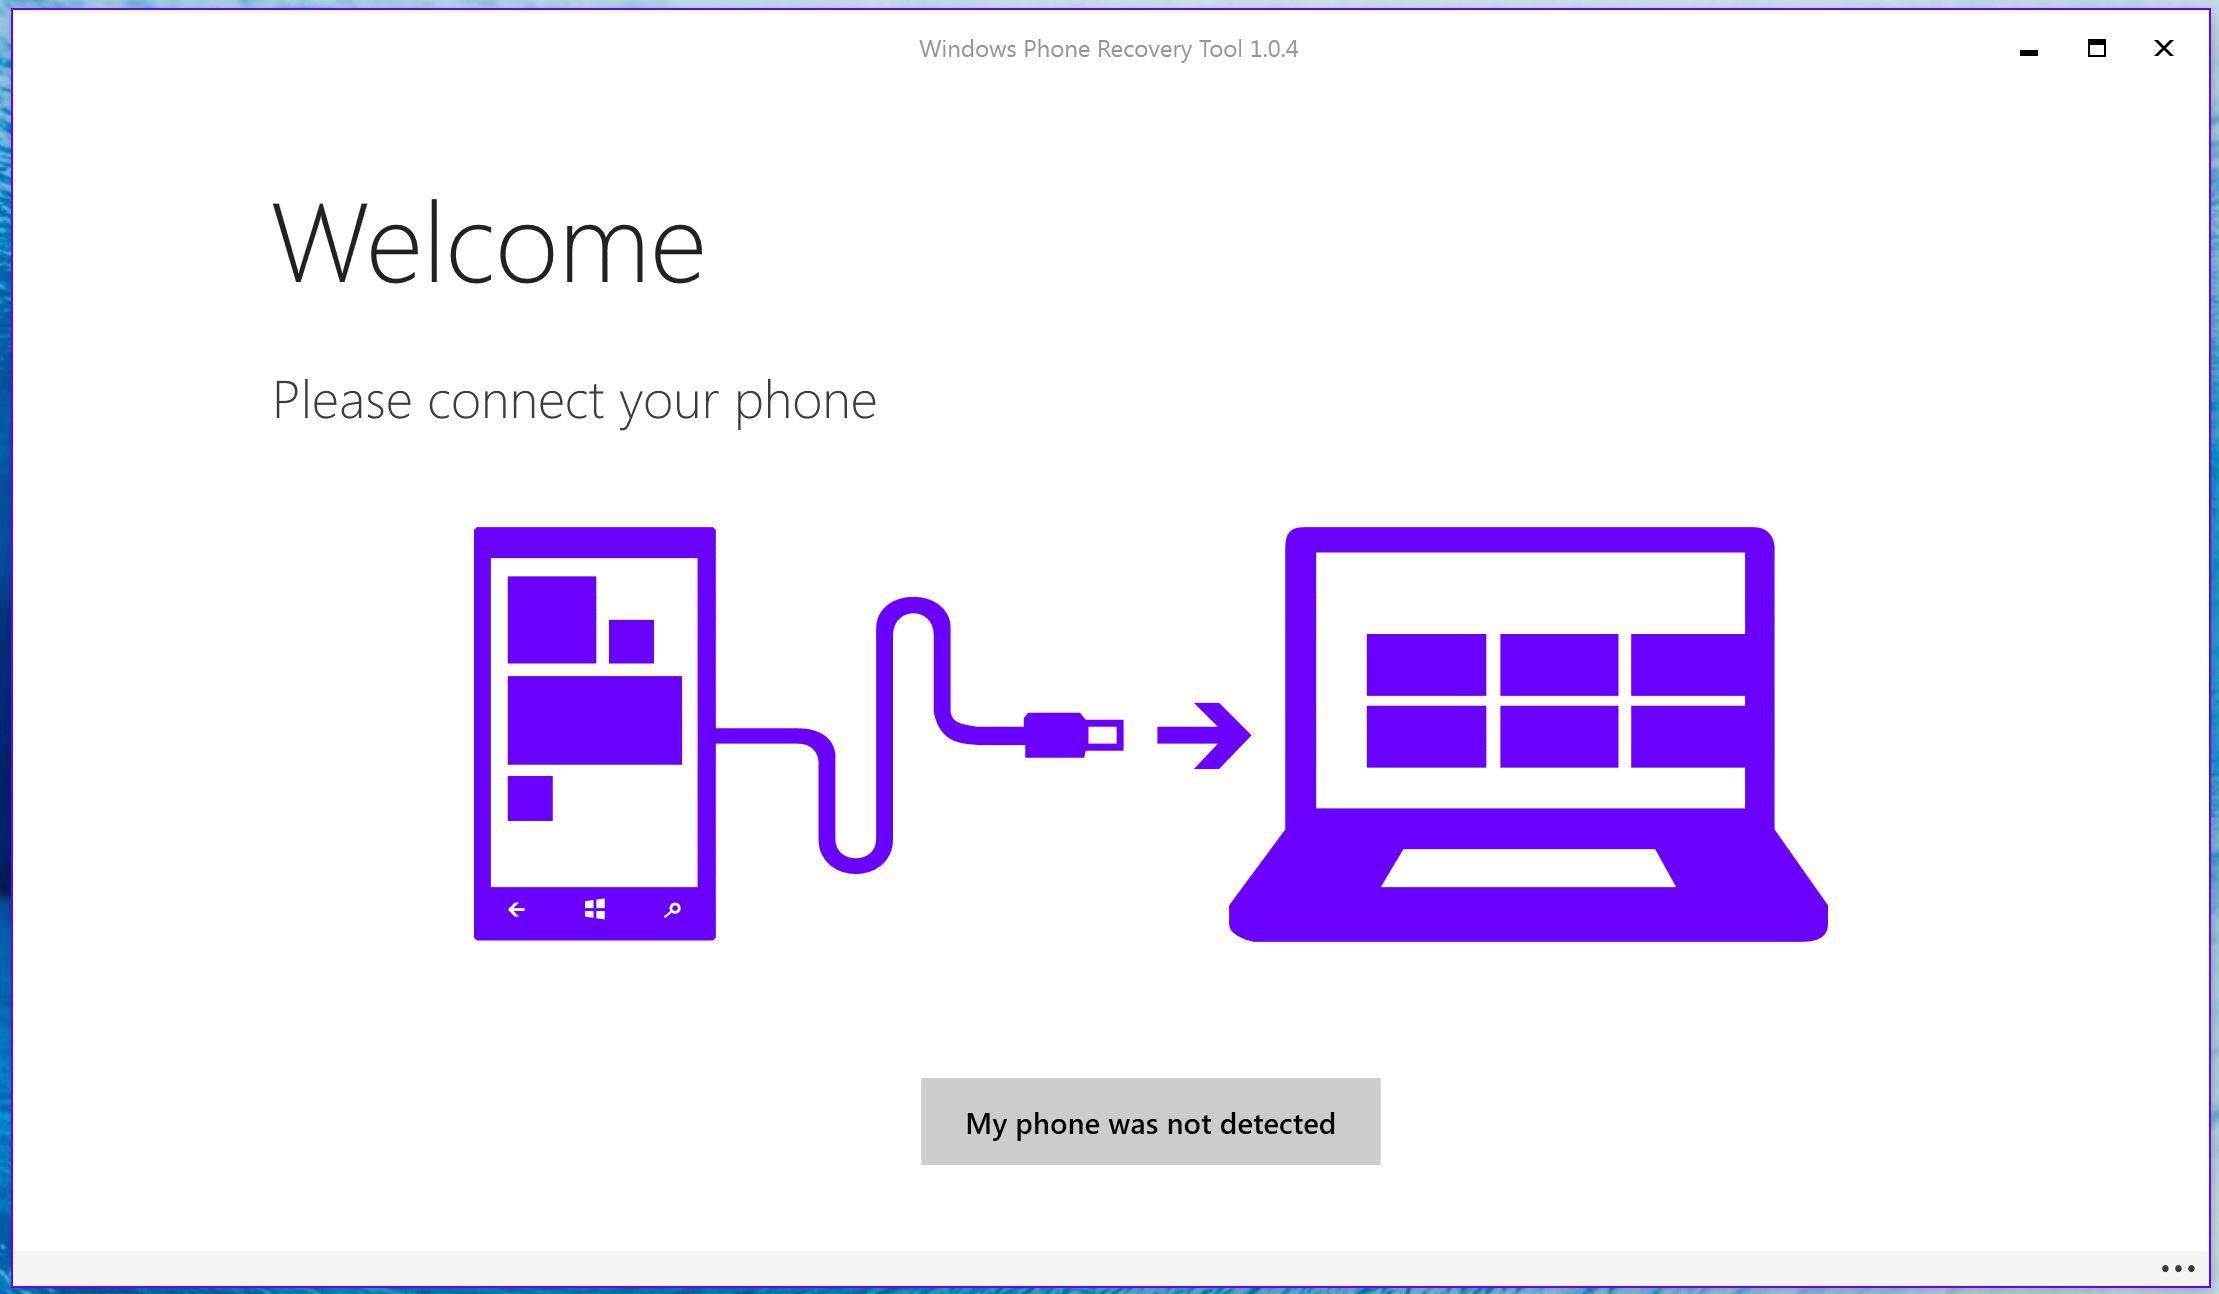 Windows-Phone-Recovery-Tool-1